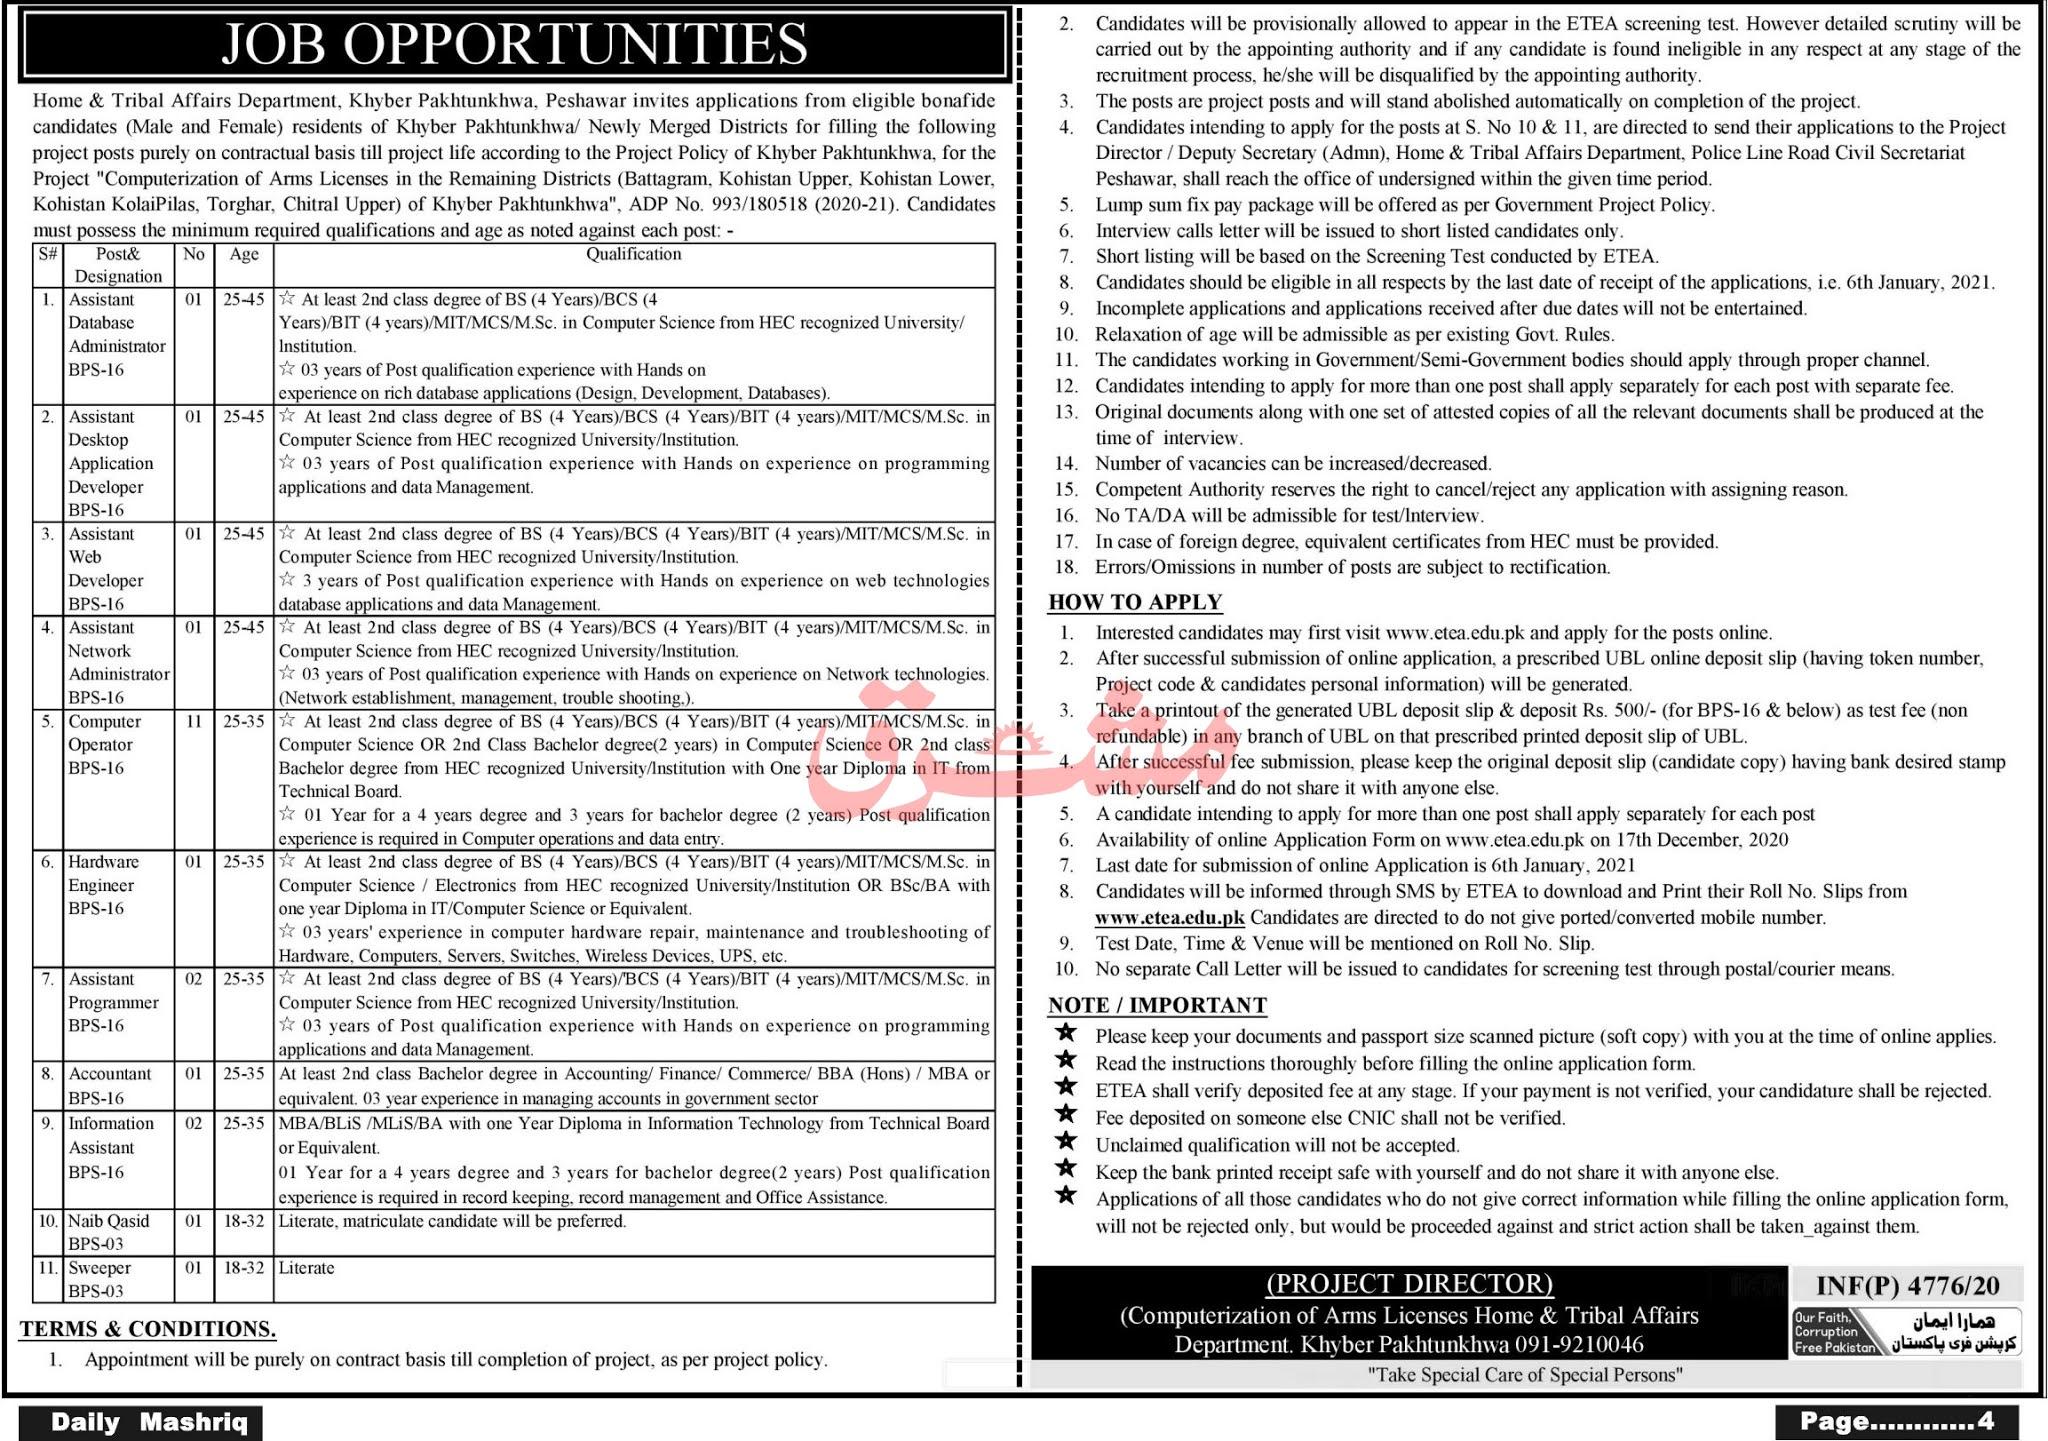 Download Job Application Form - www.etea.edu.pk - Home & Tribal Affairs Department Jobs